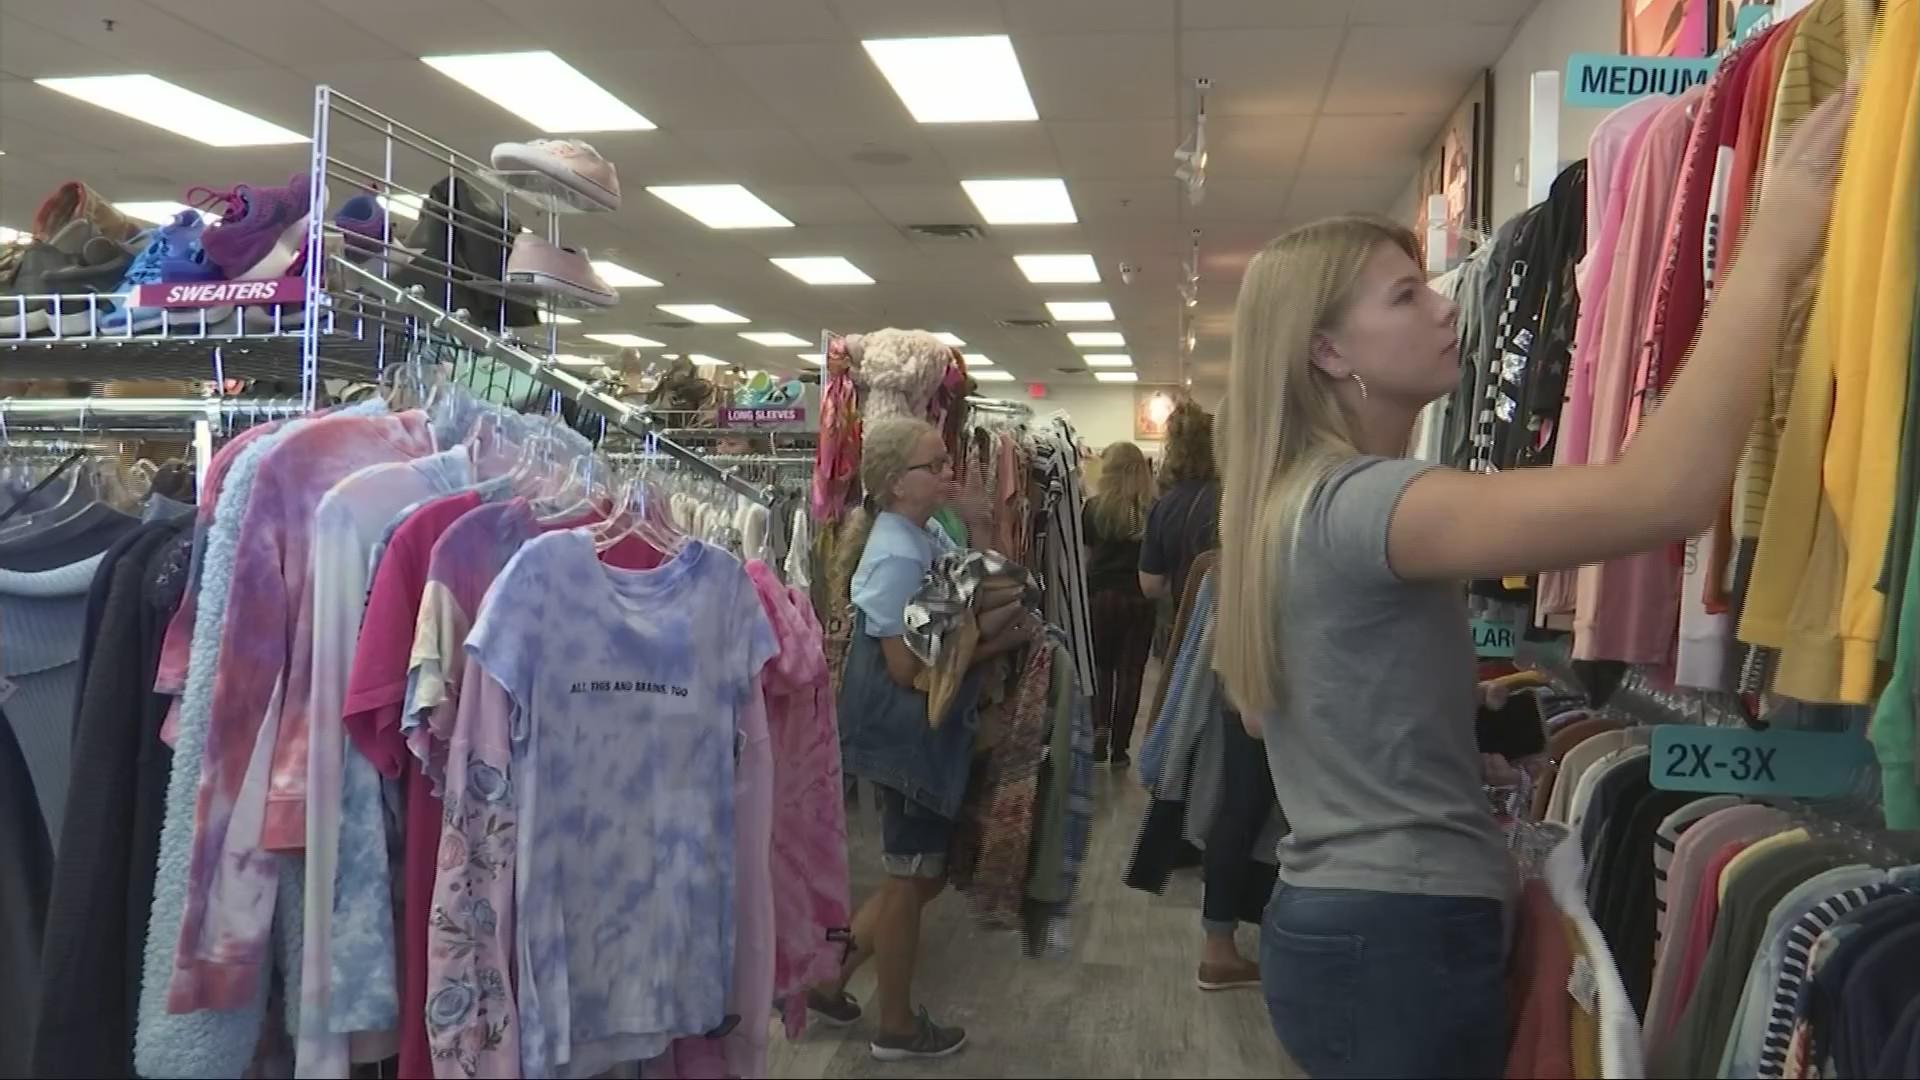 Plato S Closet Opens In South Charleston Wowk 13 News